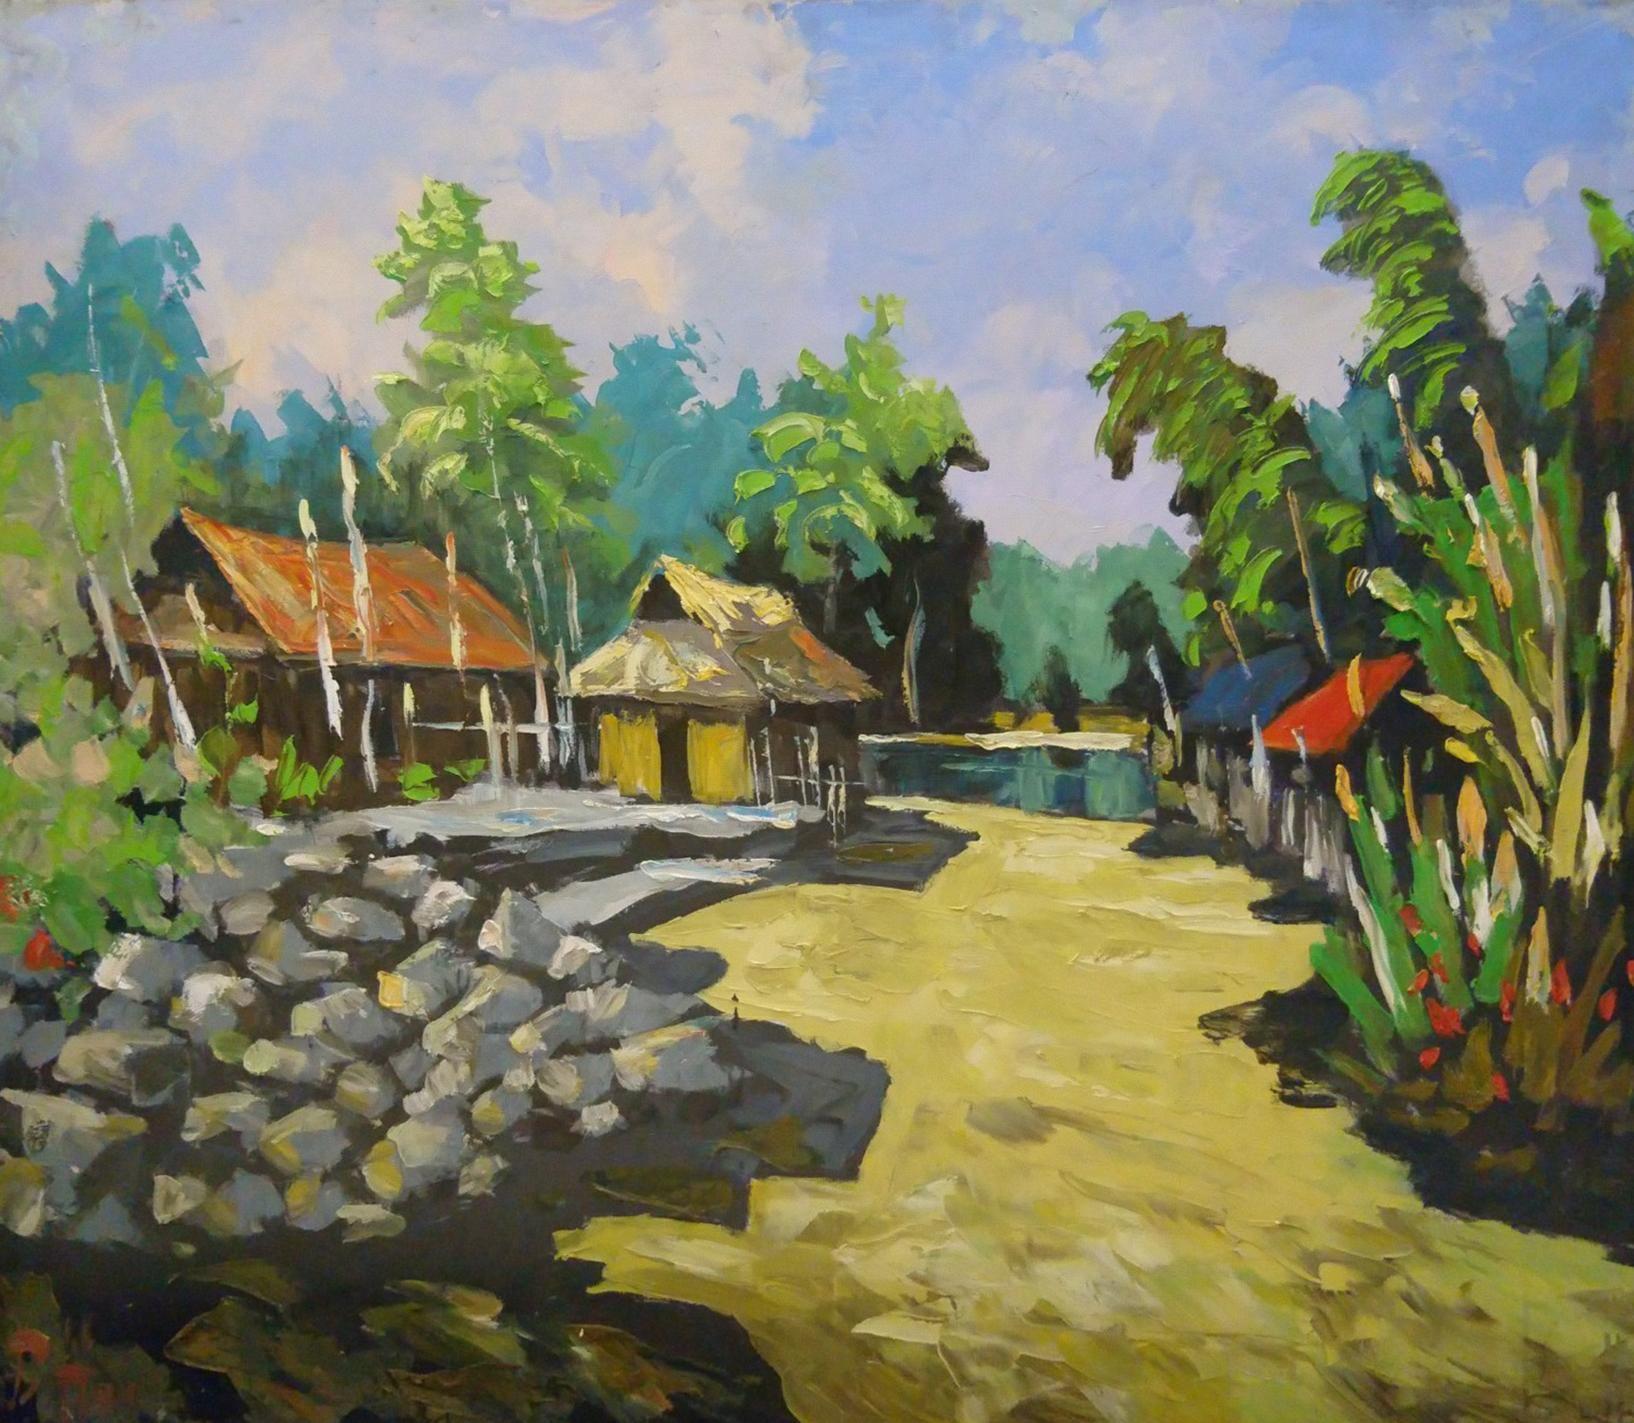 Village Scenery Handmade Oil Painting In D C Art Gallery Hanoi Vietnam 100 X 120 Cm Oilpainting Art Handmade Painting City Art Oil Painting